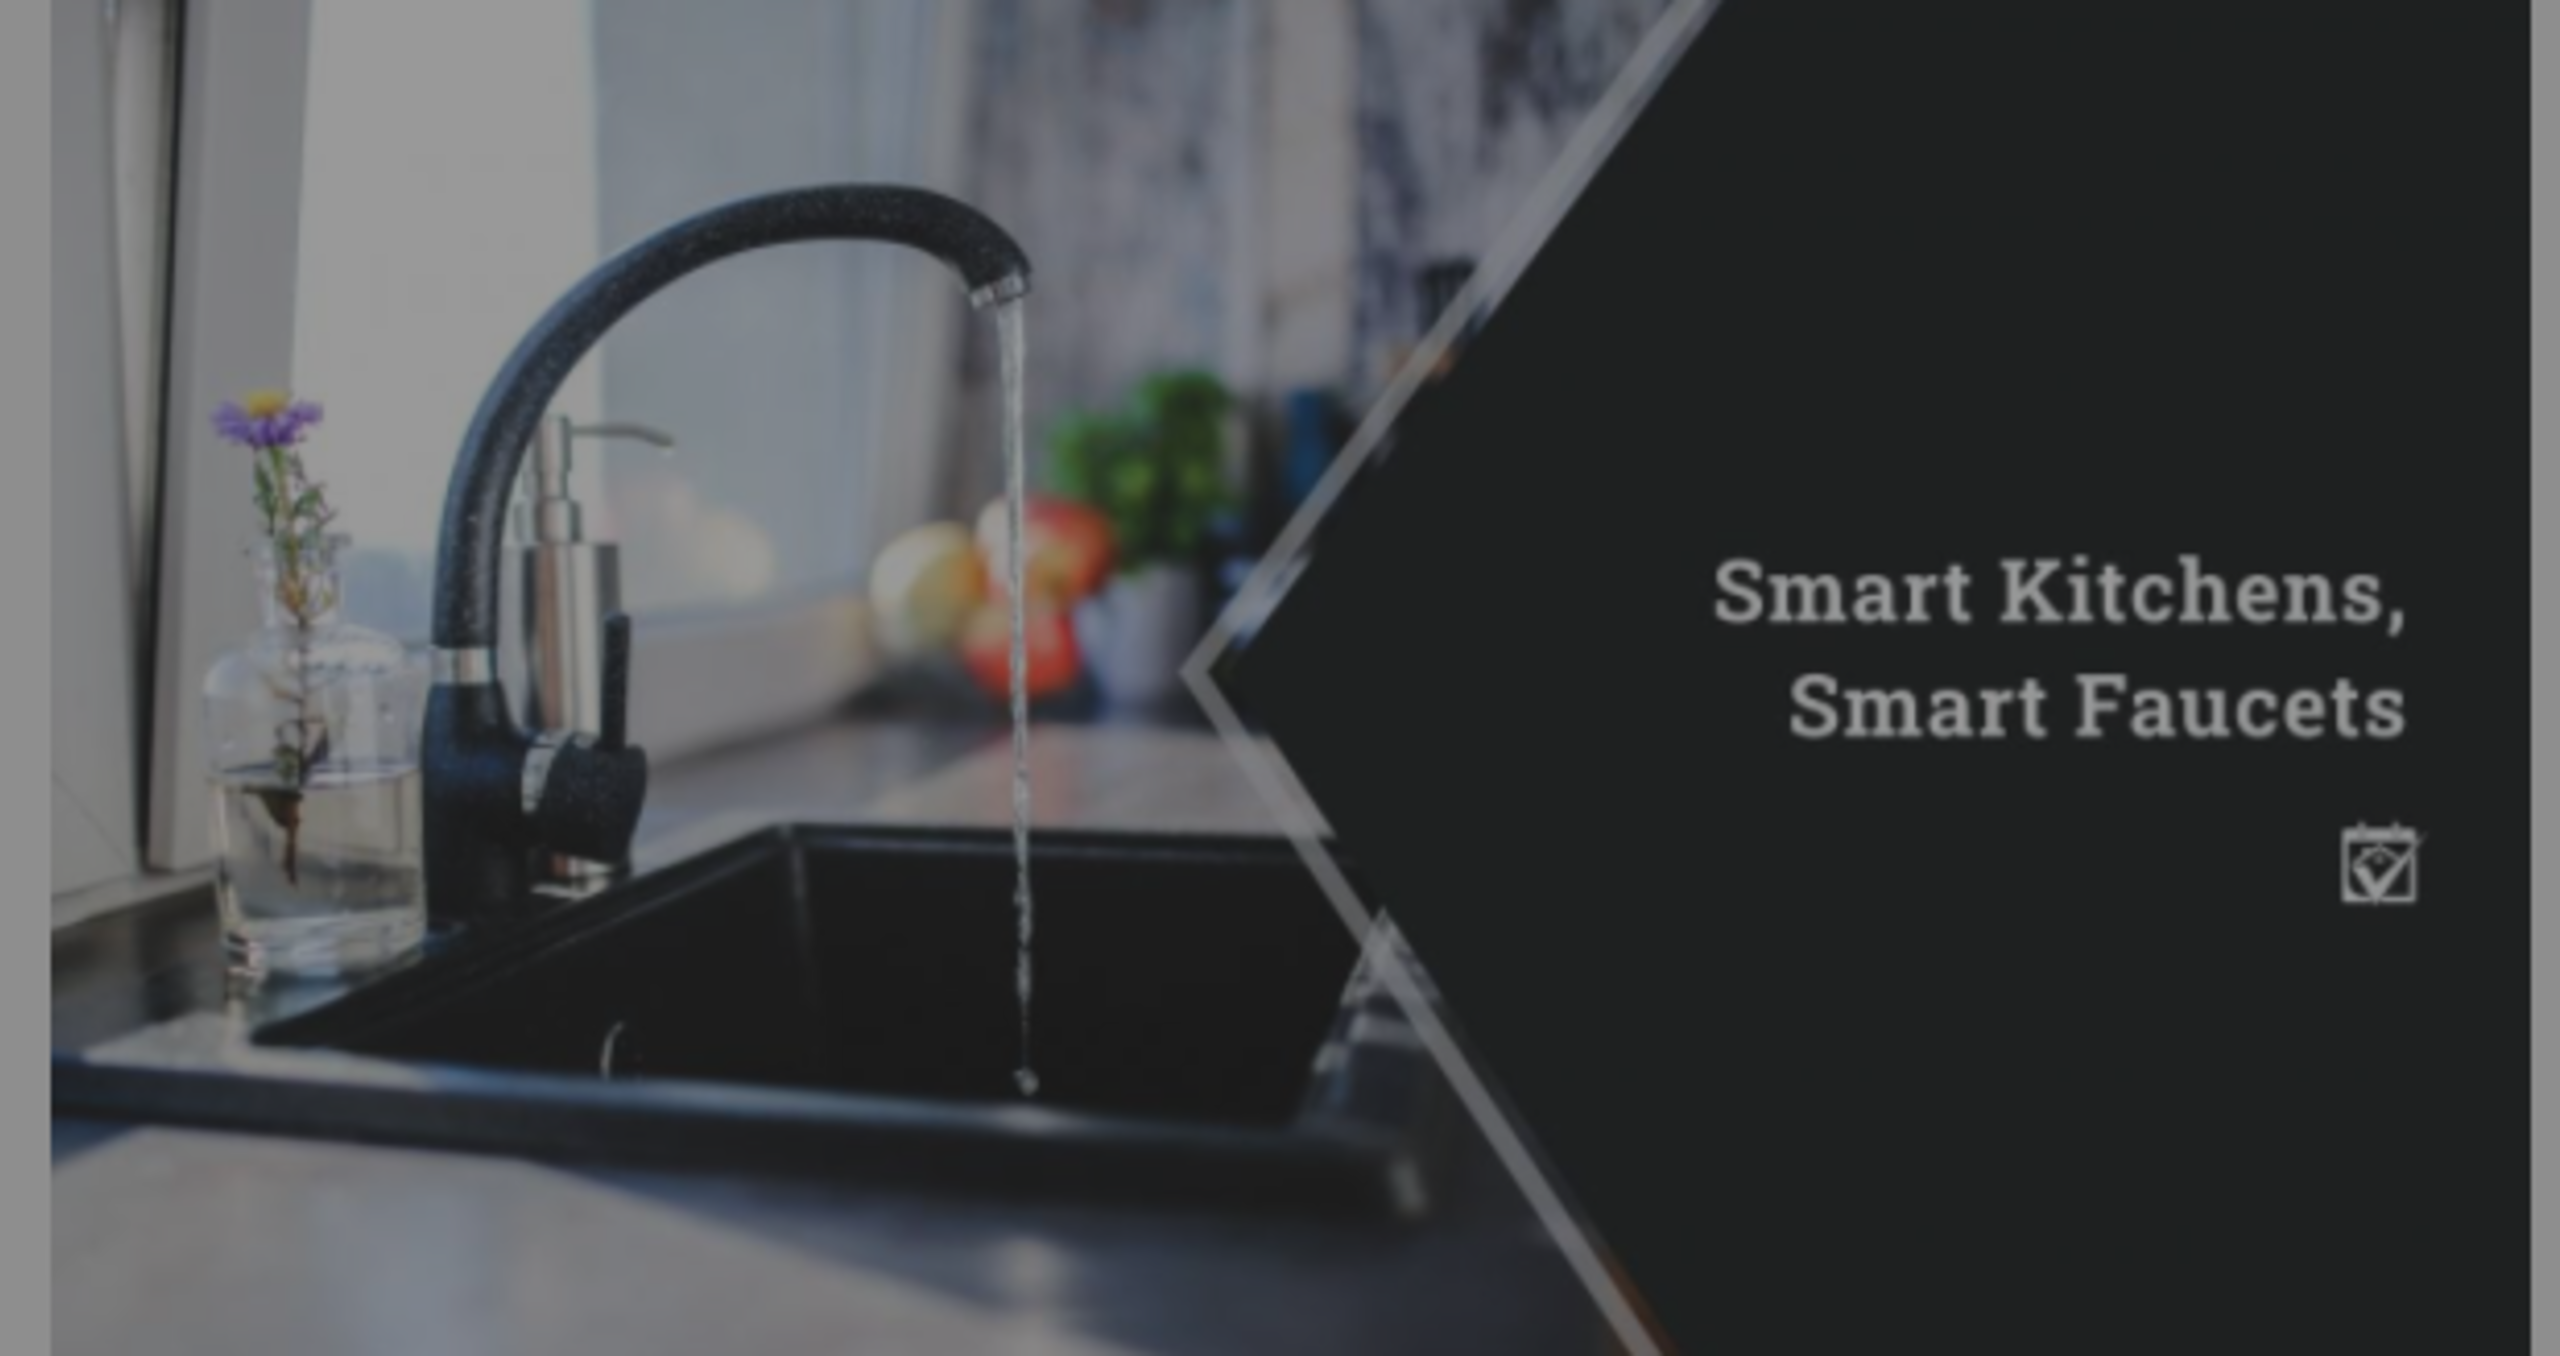 Smart Kitchens, Smart Faucets